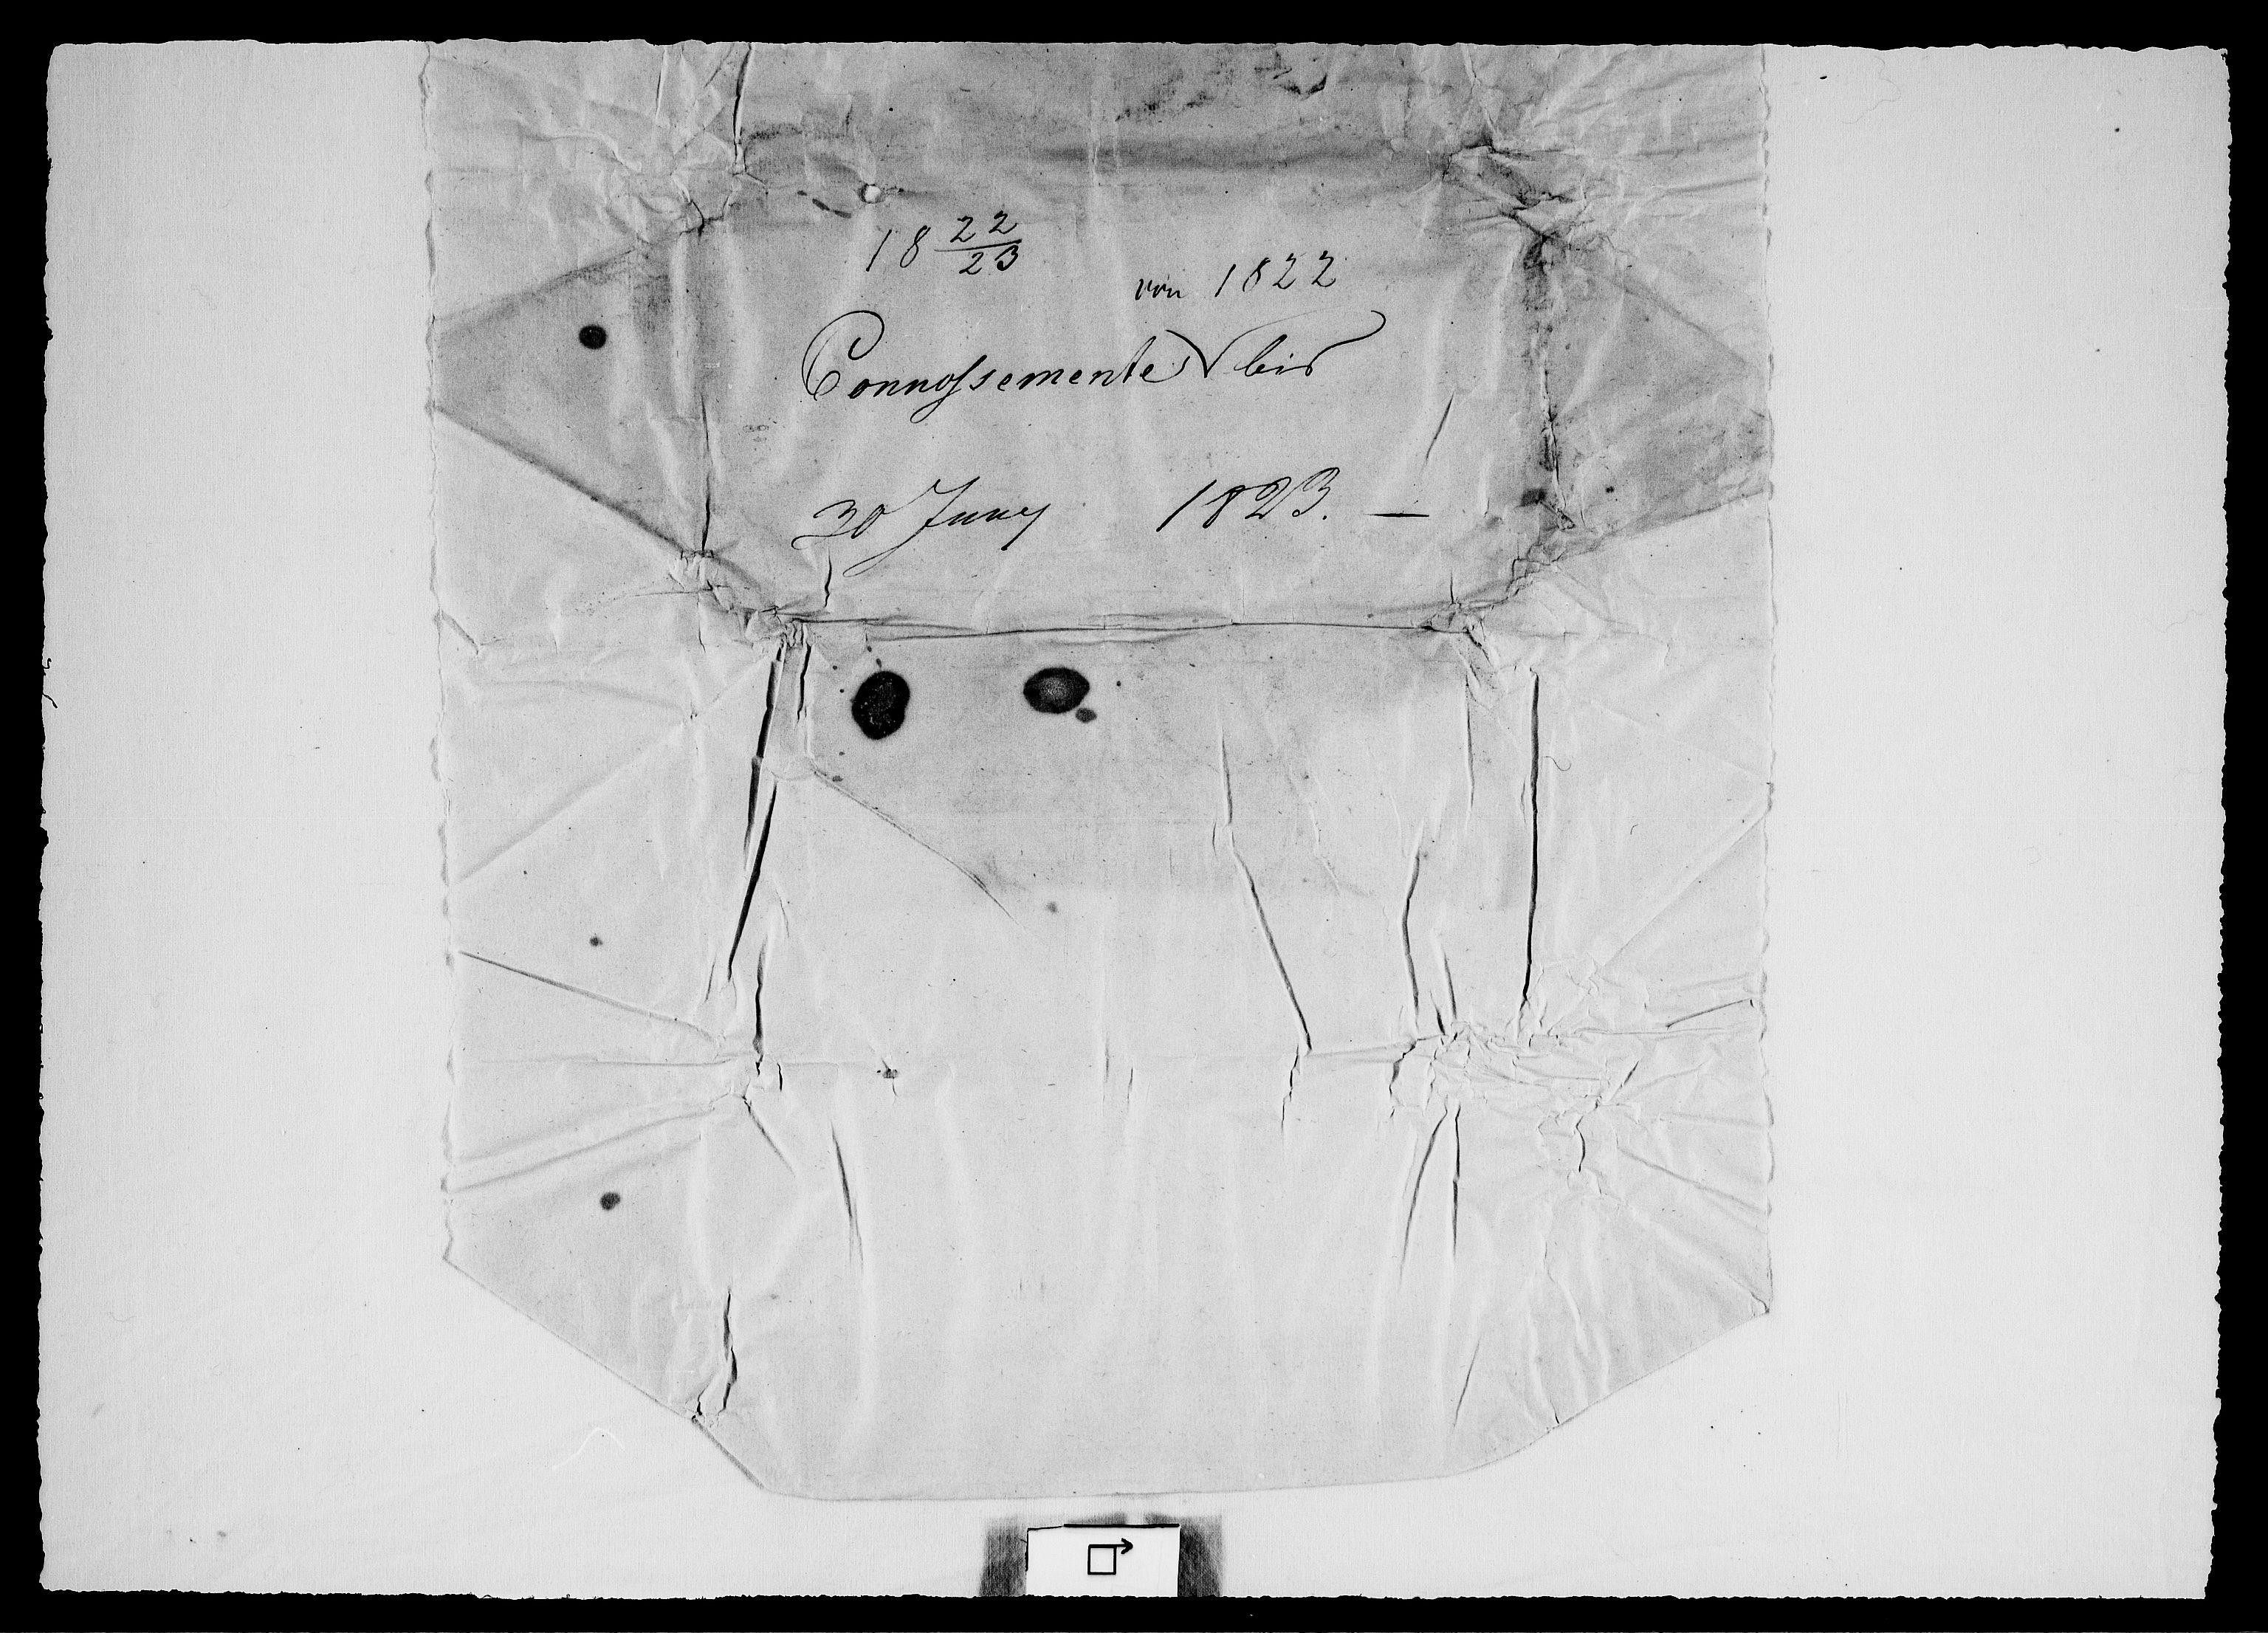 RA, Modums Blaafarveværk, G/Gd/Gdc/L0225, 1822-1834, s. 2